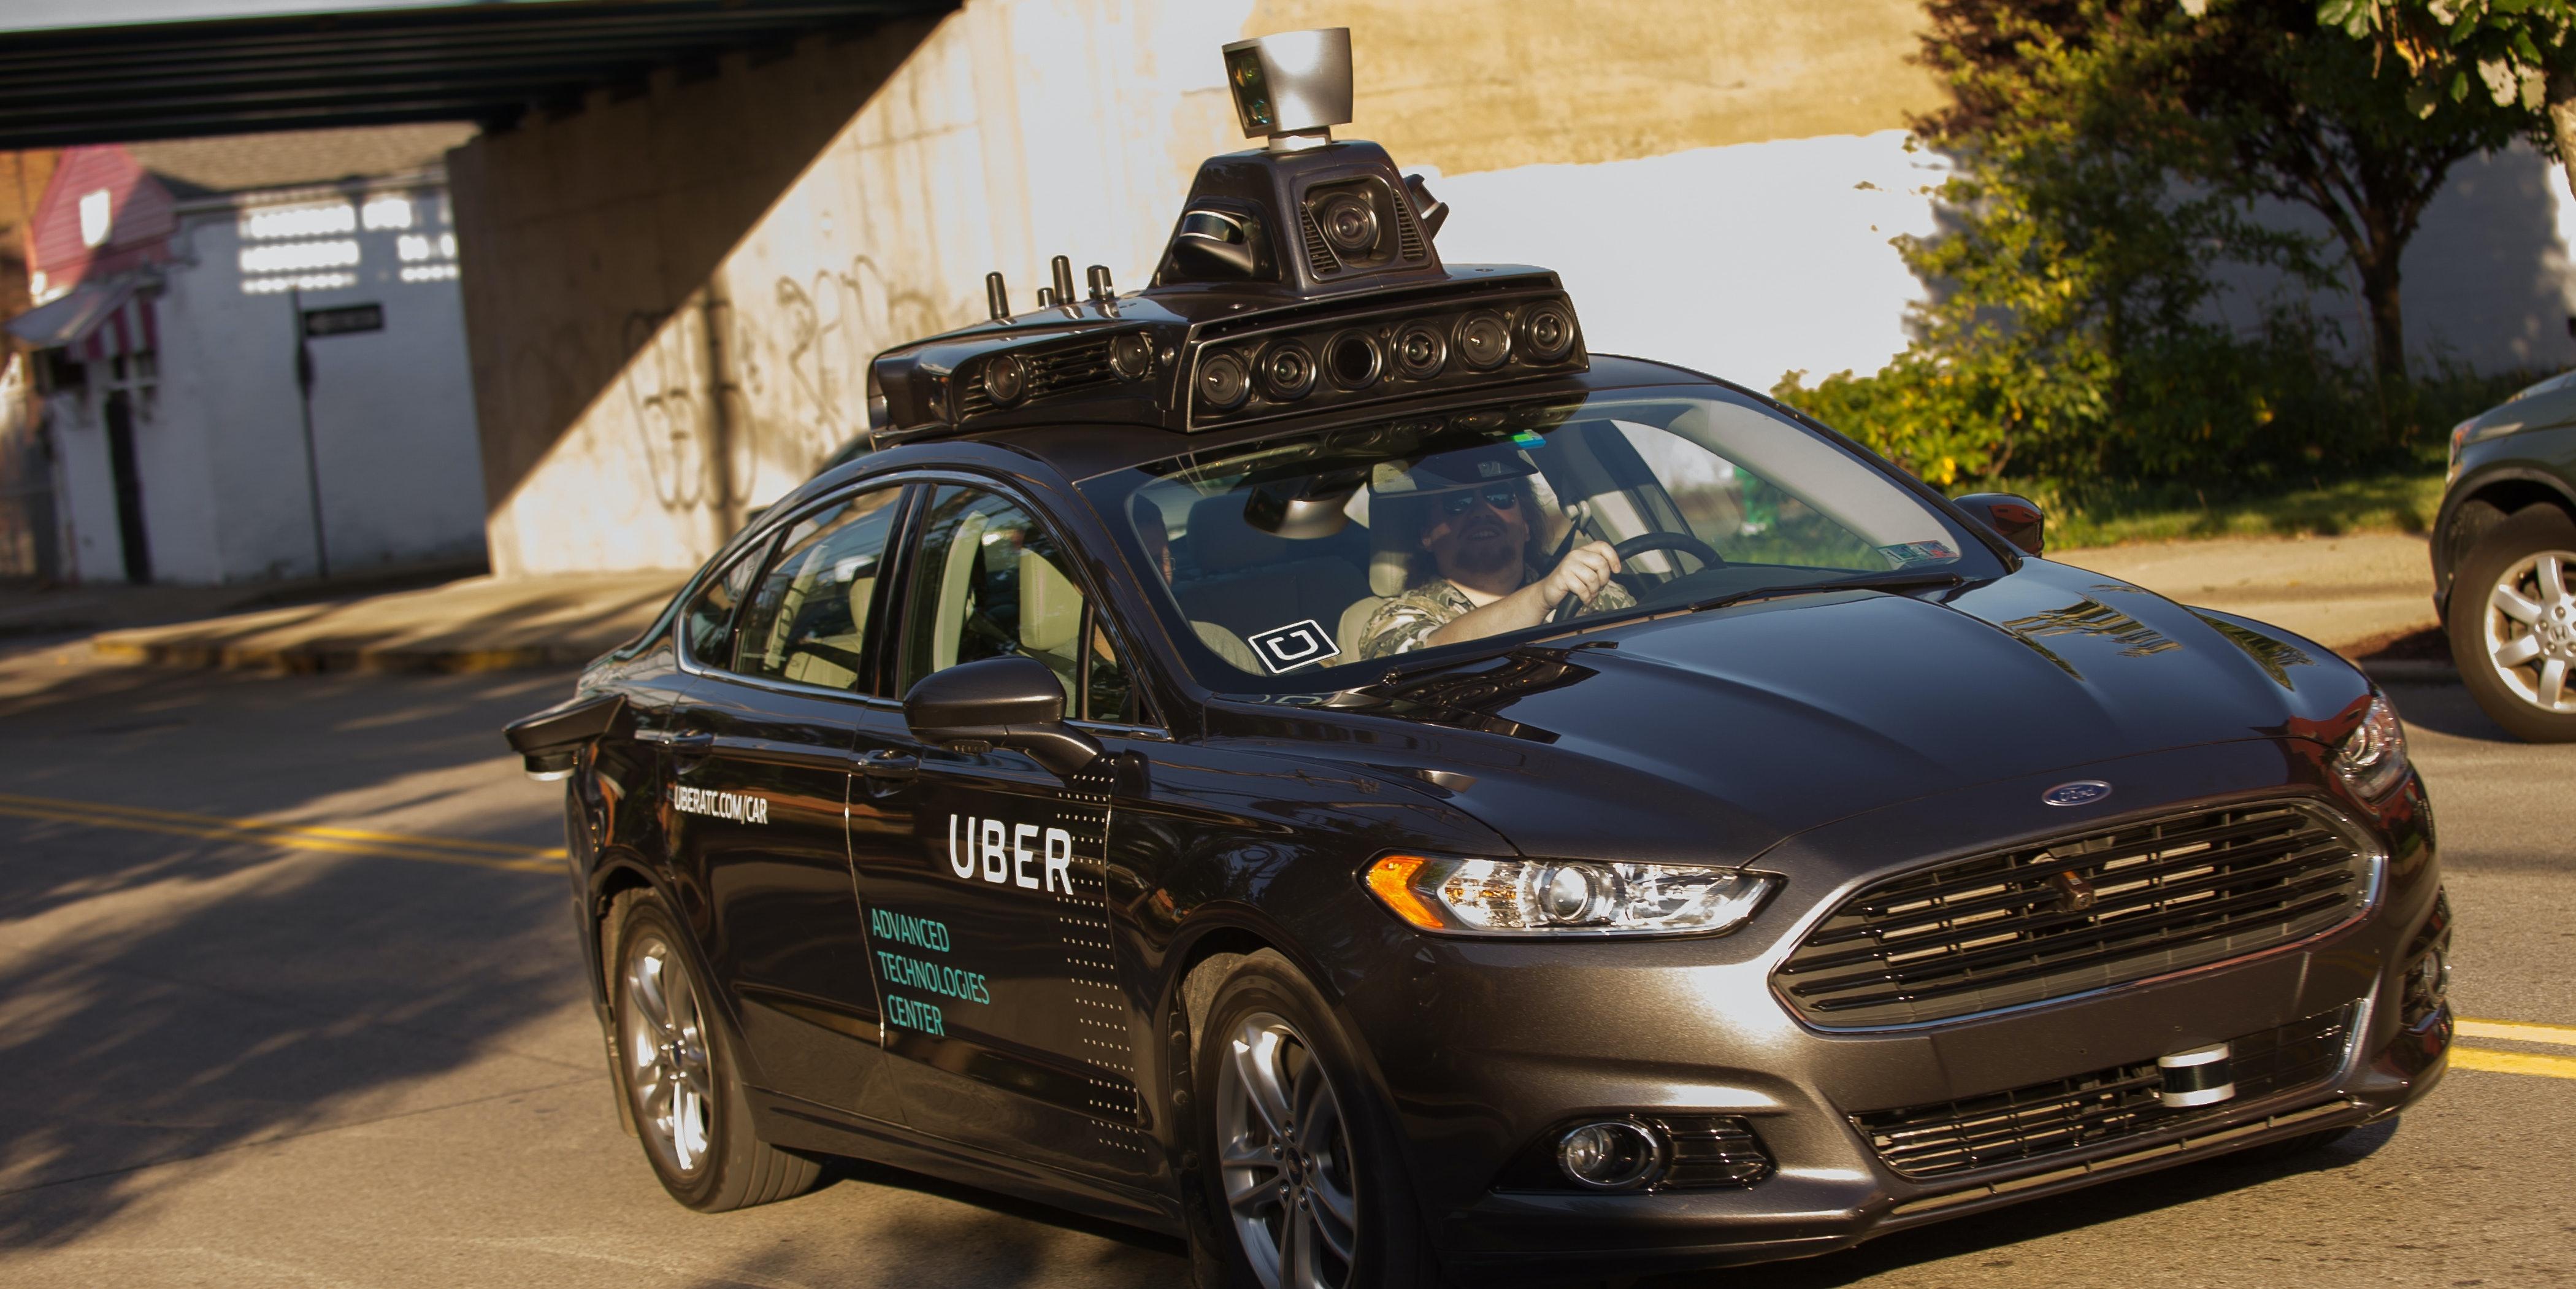 An Uber driverless Ford Fusion drives down Pittsburgh's Smallman Street.